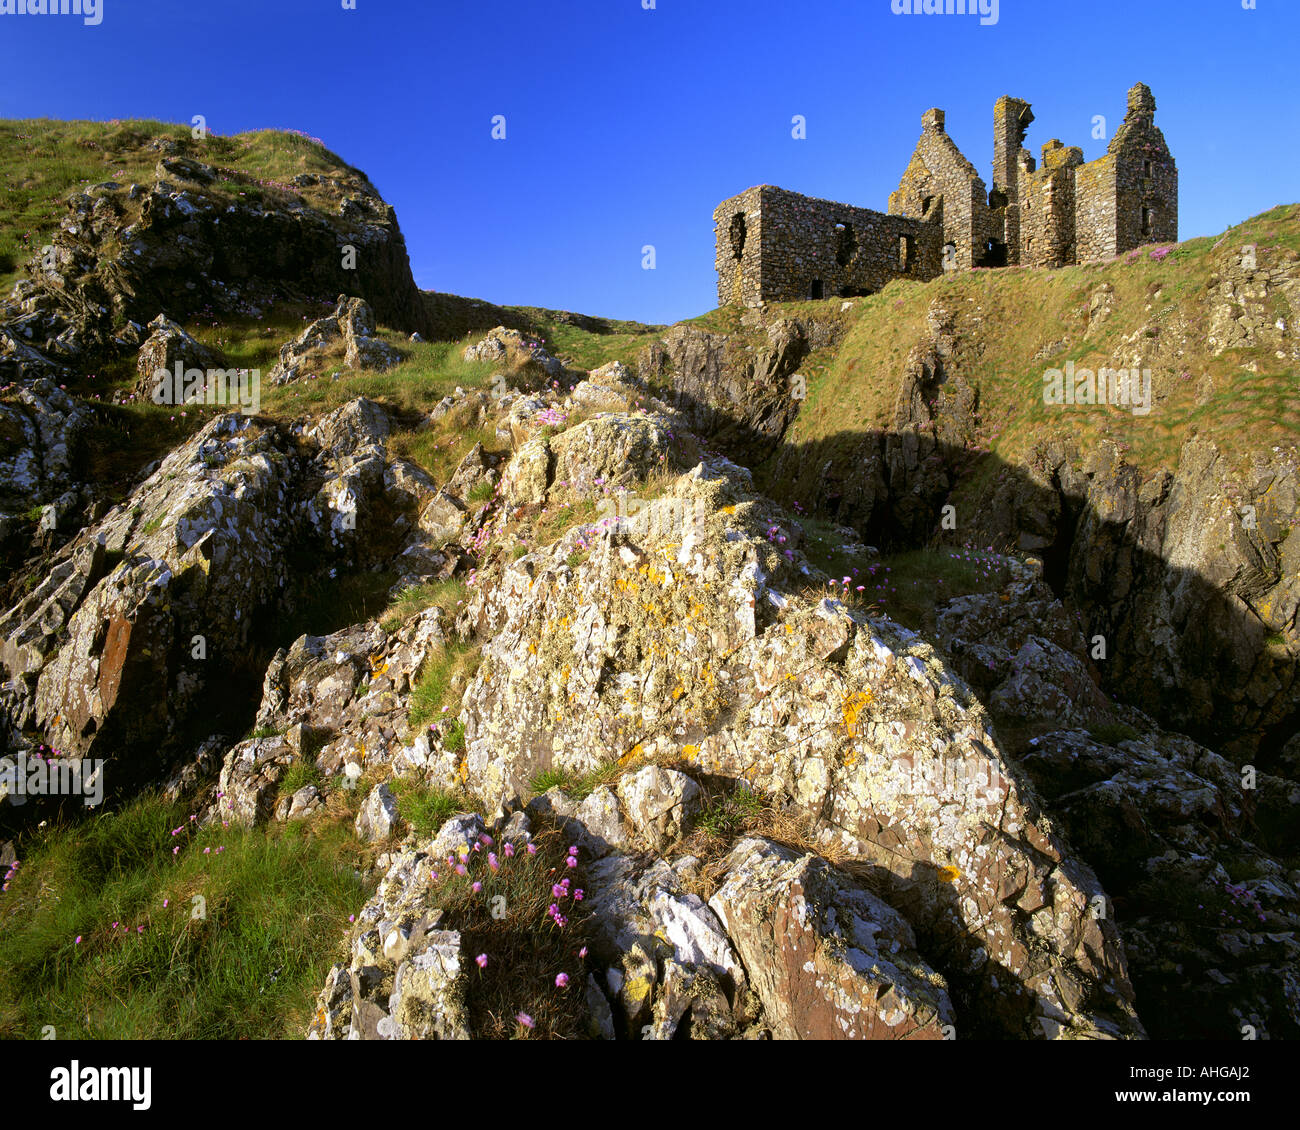 GB - Schottland: Dunskey Castle in Dumfries & Galloway Stockbild